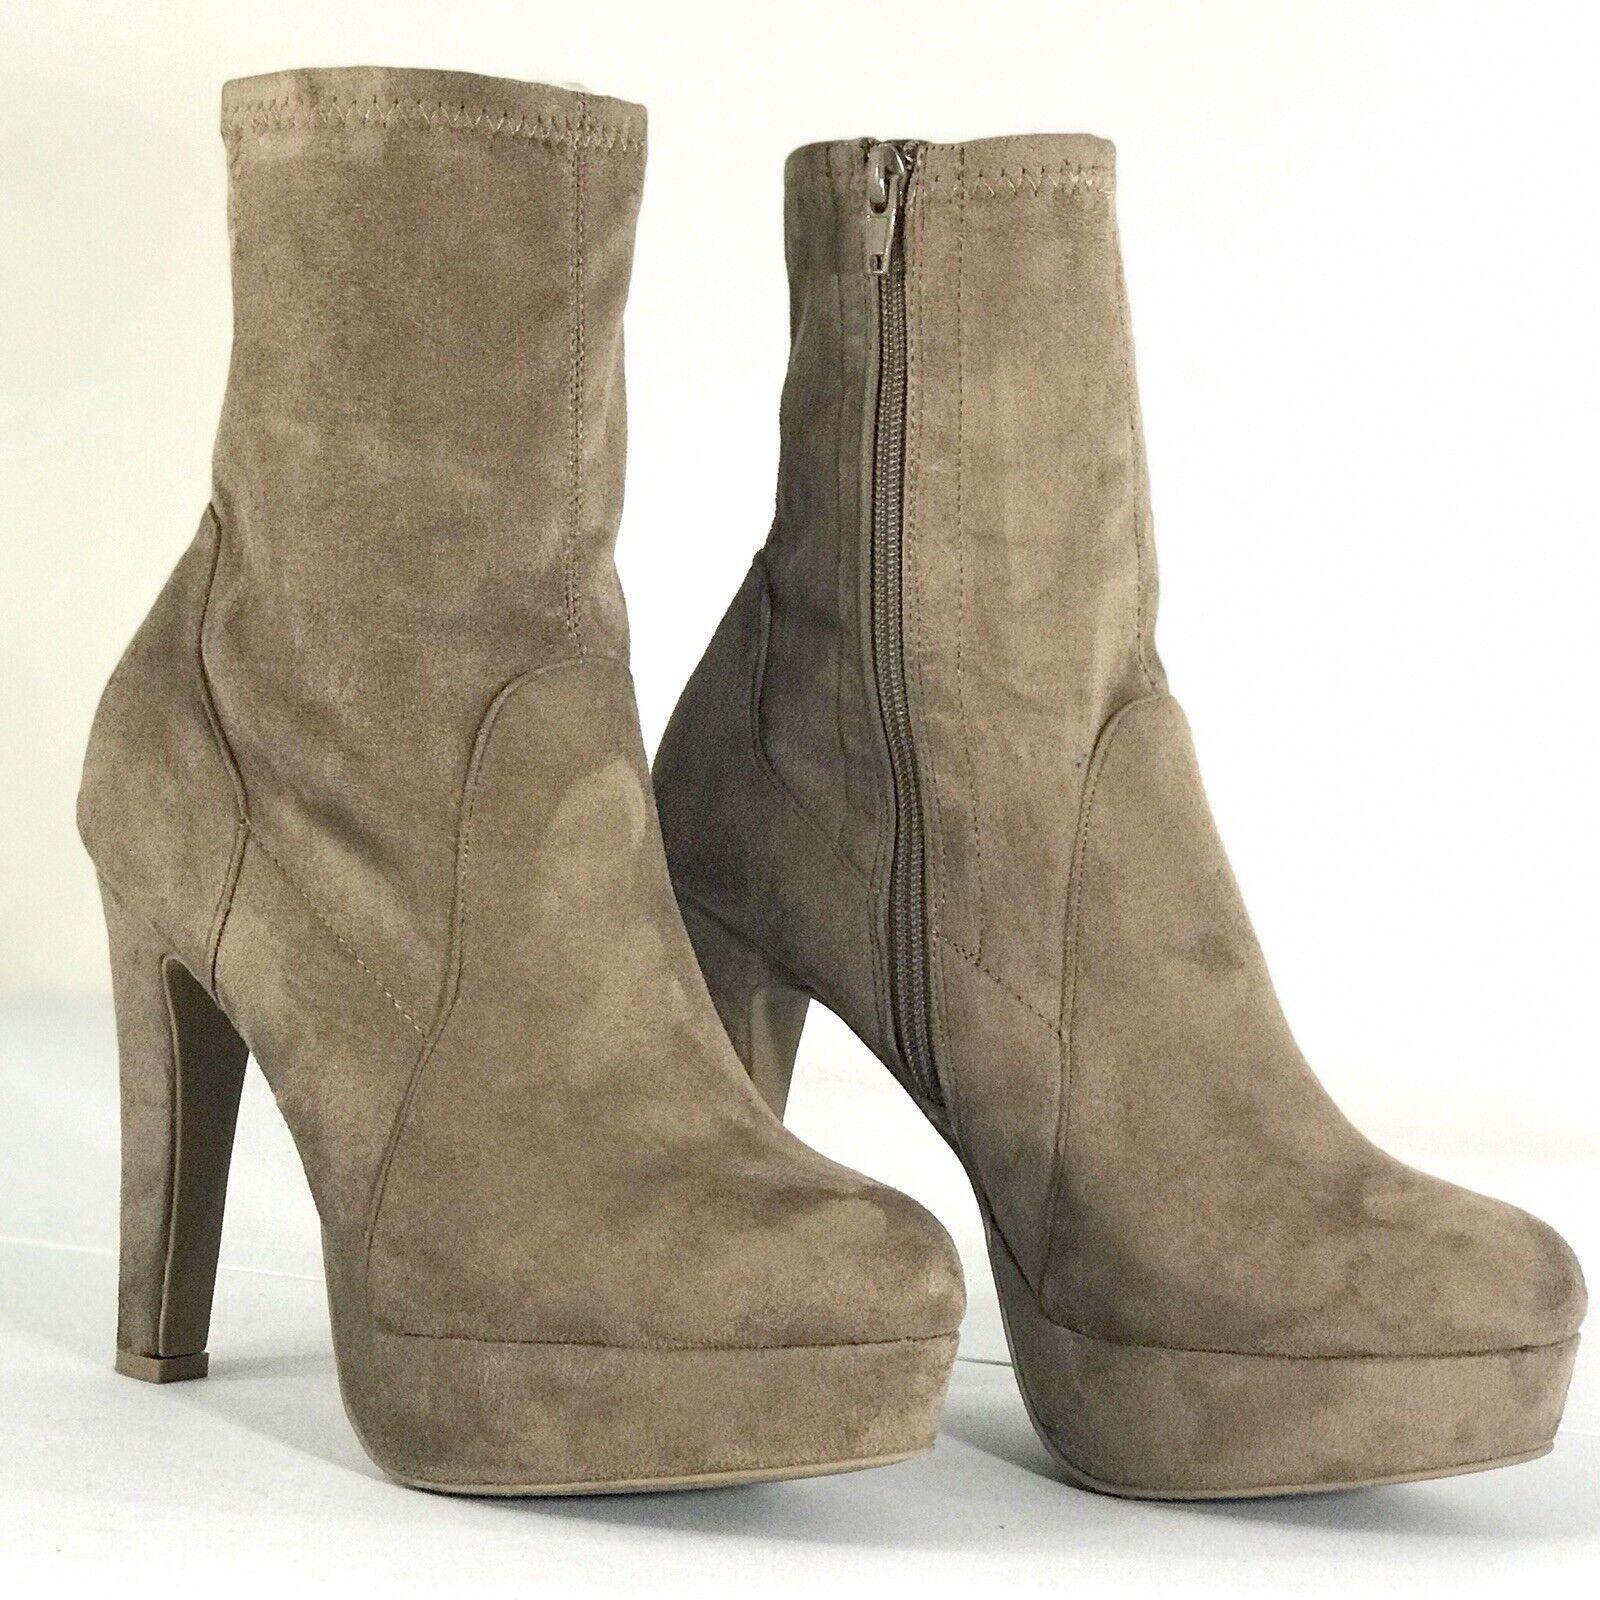 Platform Suede Ankle Booties Heels Tan Women Shoes Size 9